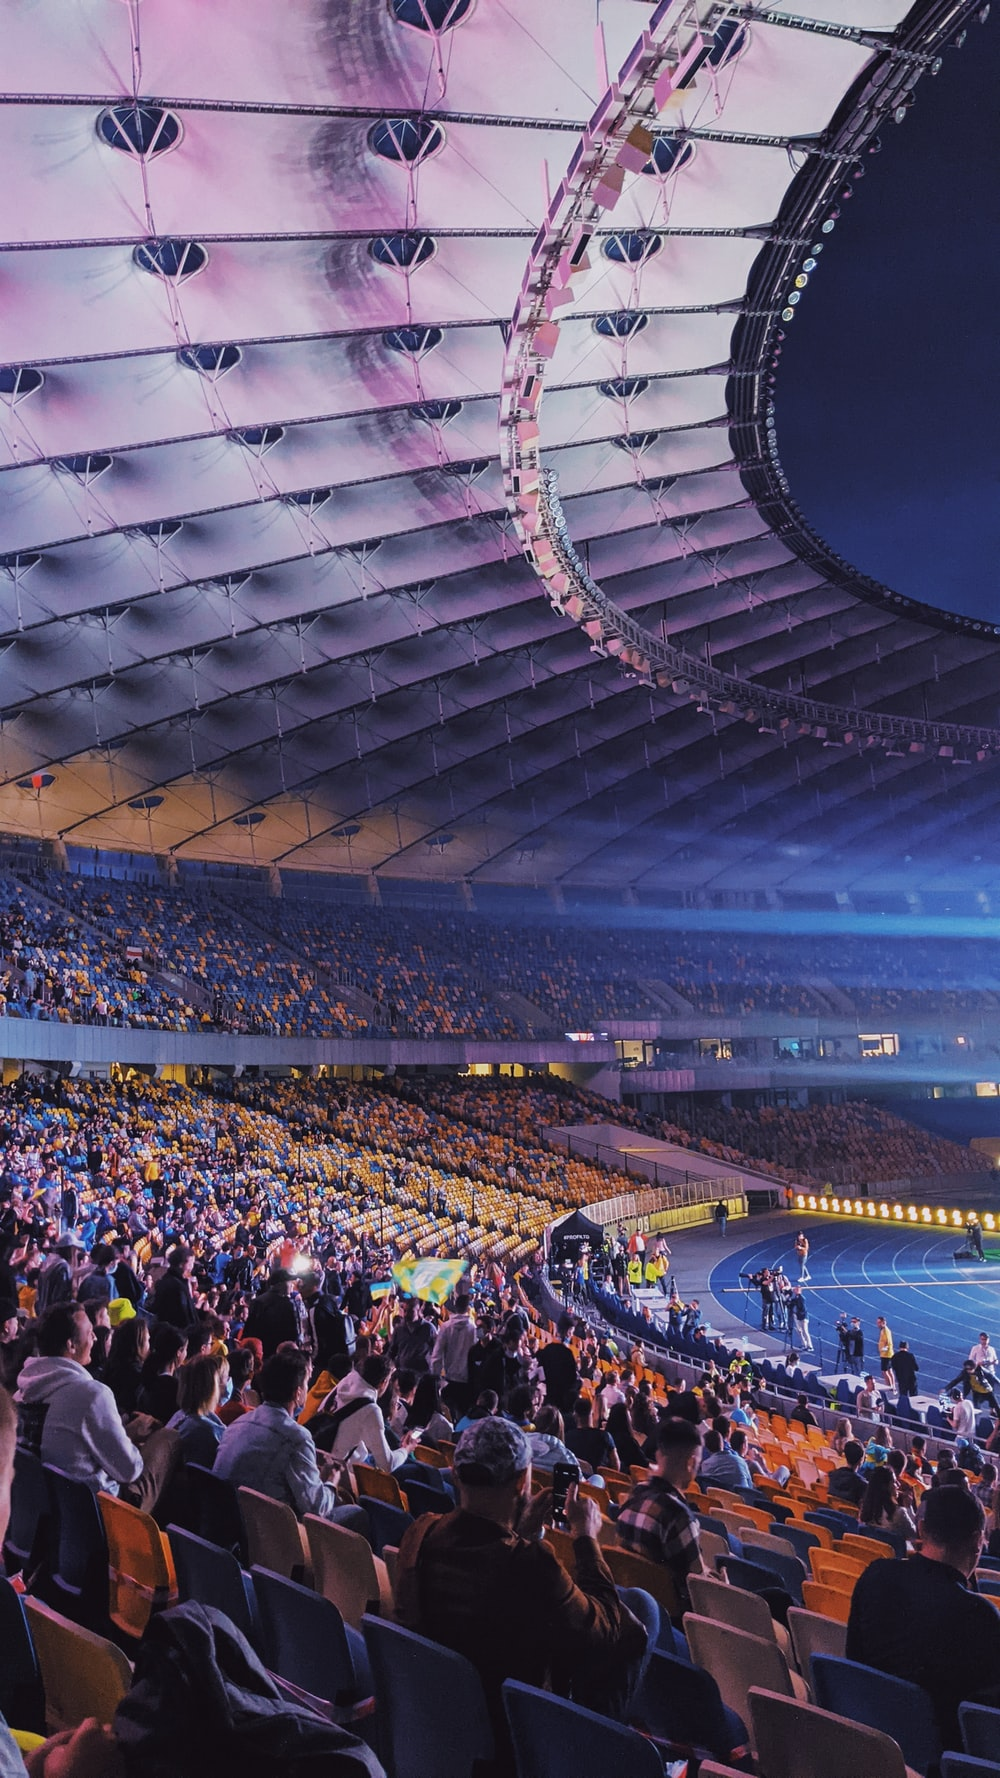 people in stadium during nighttime